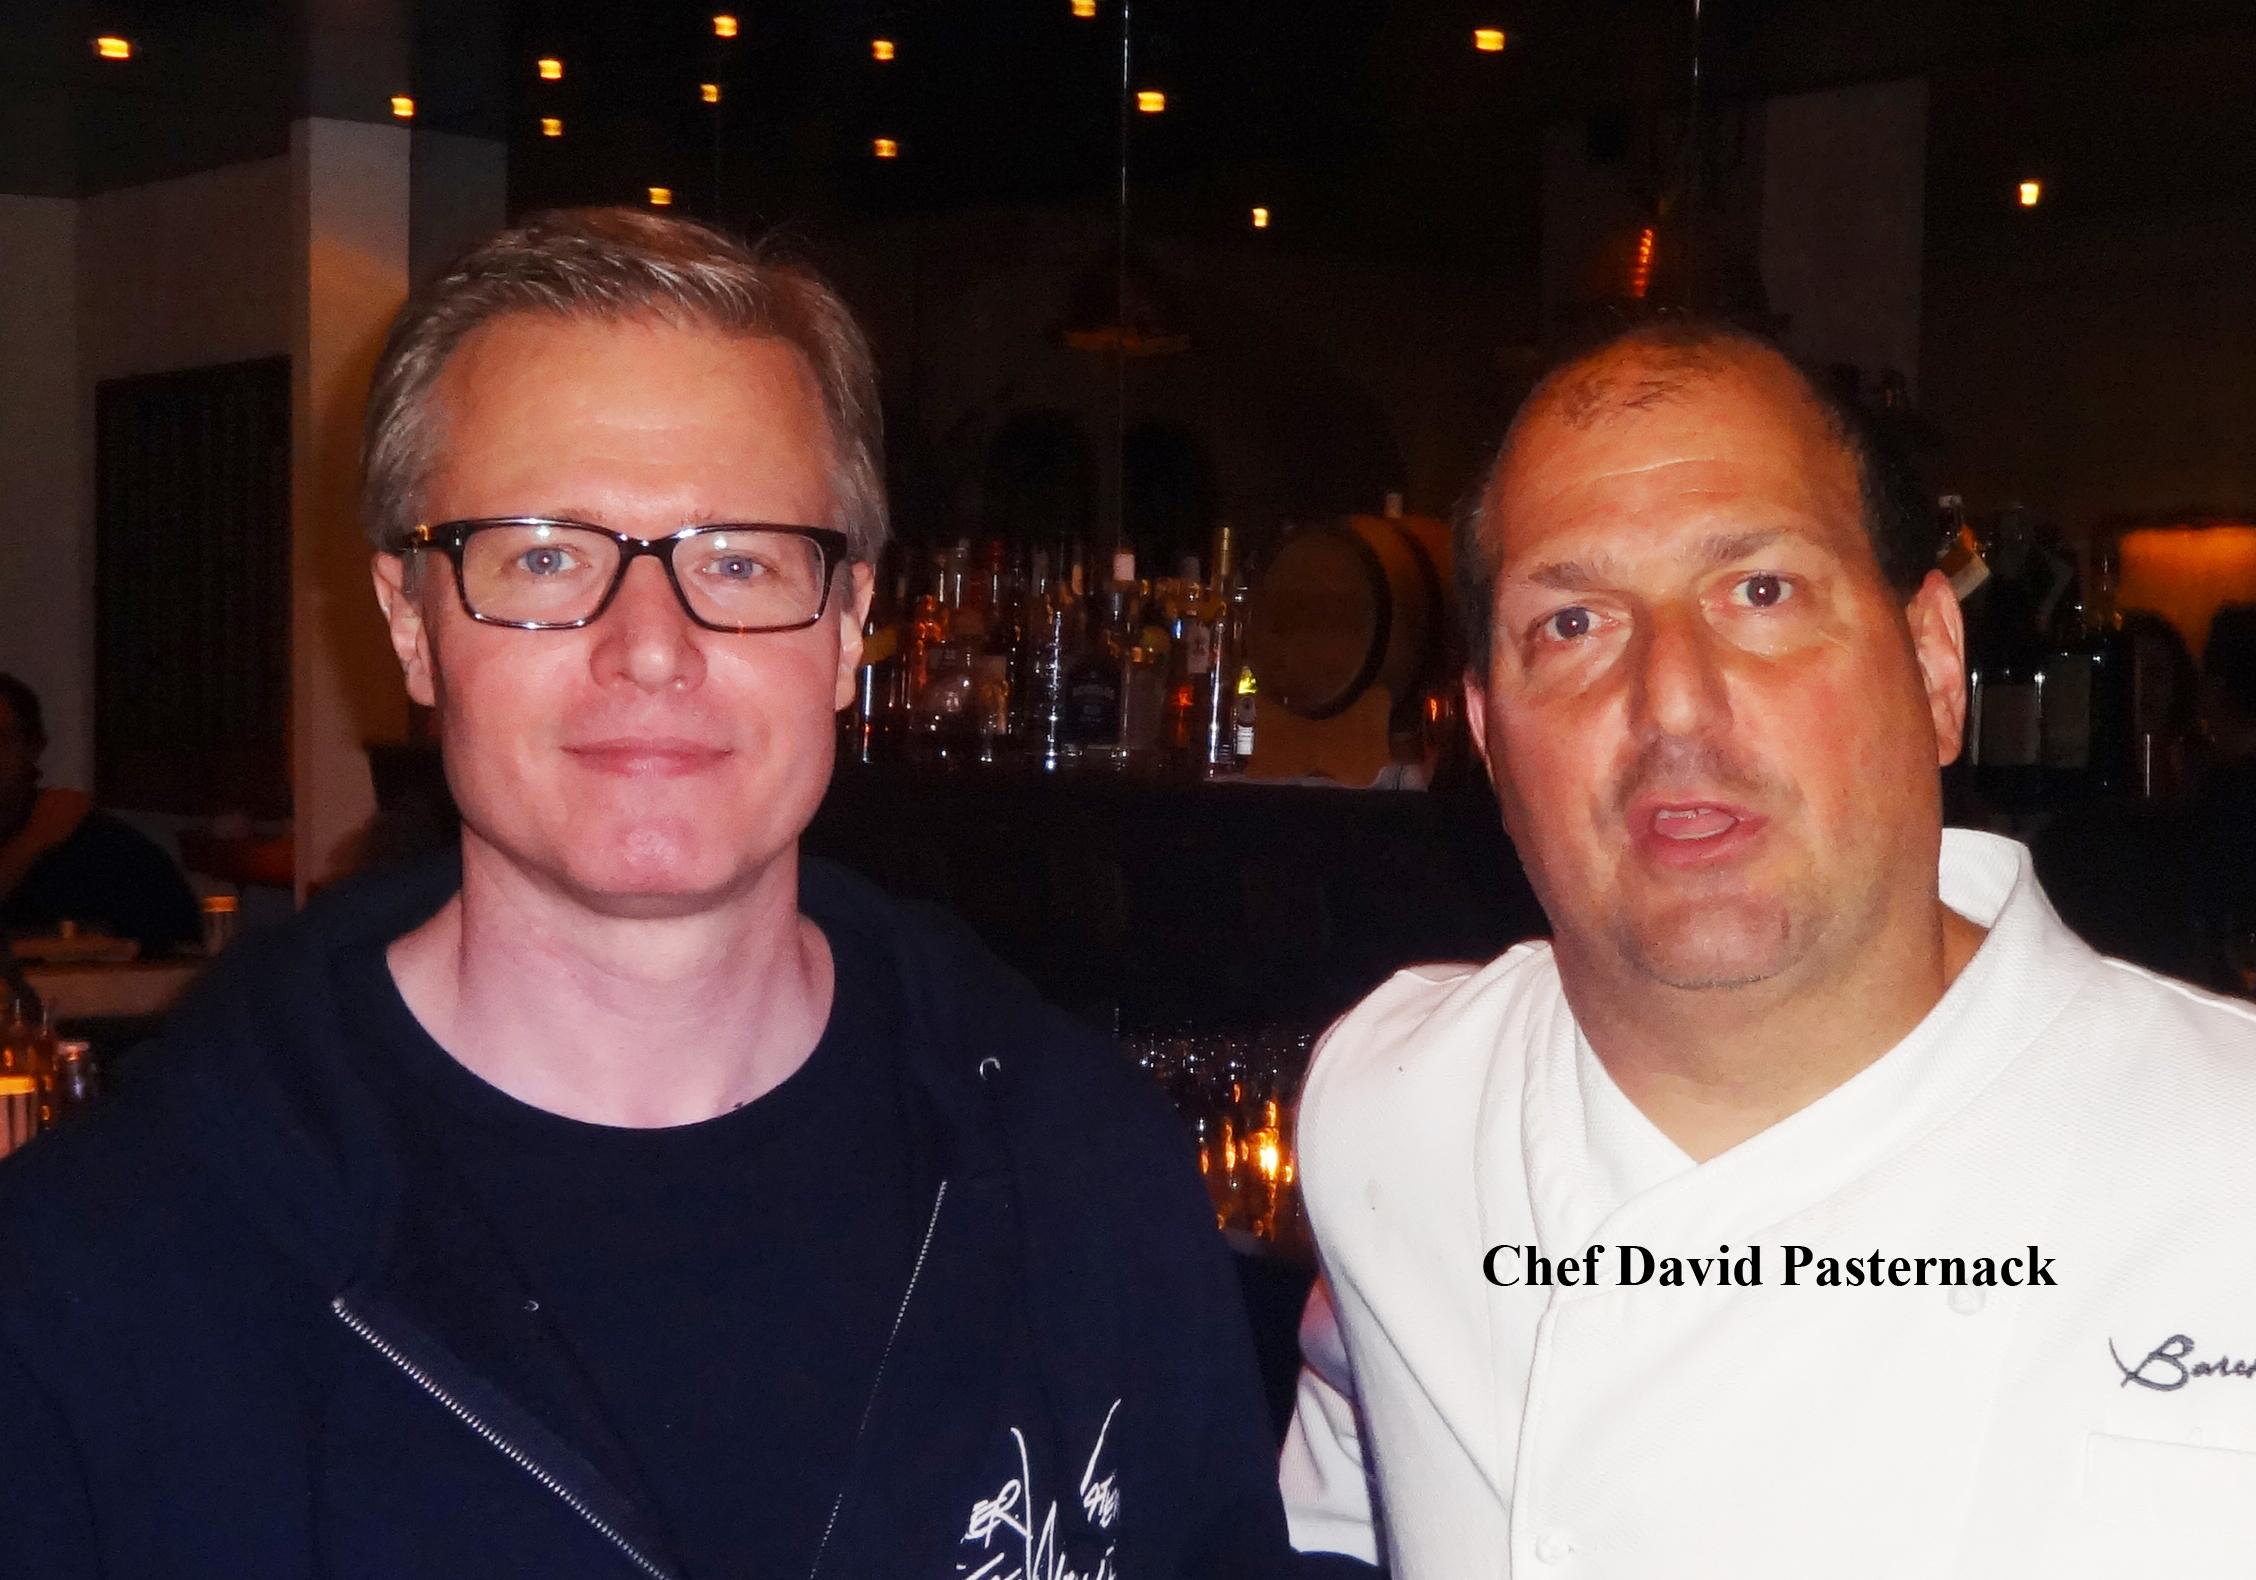 Barchetta Dave Pasternack and me Photo 2